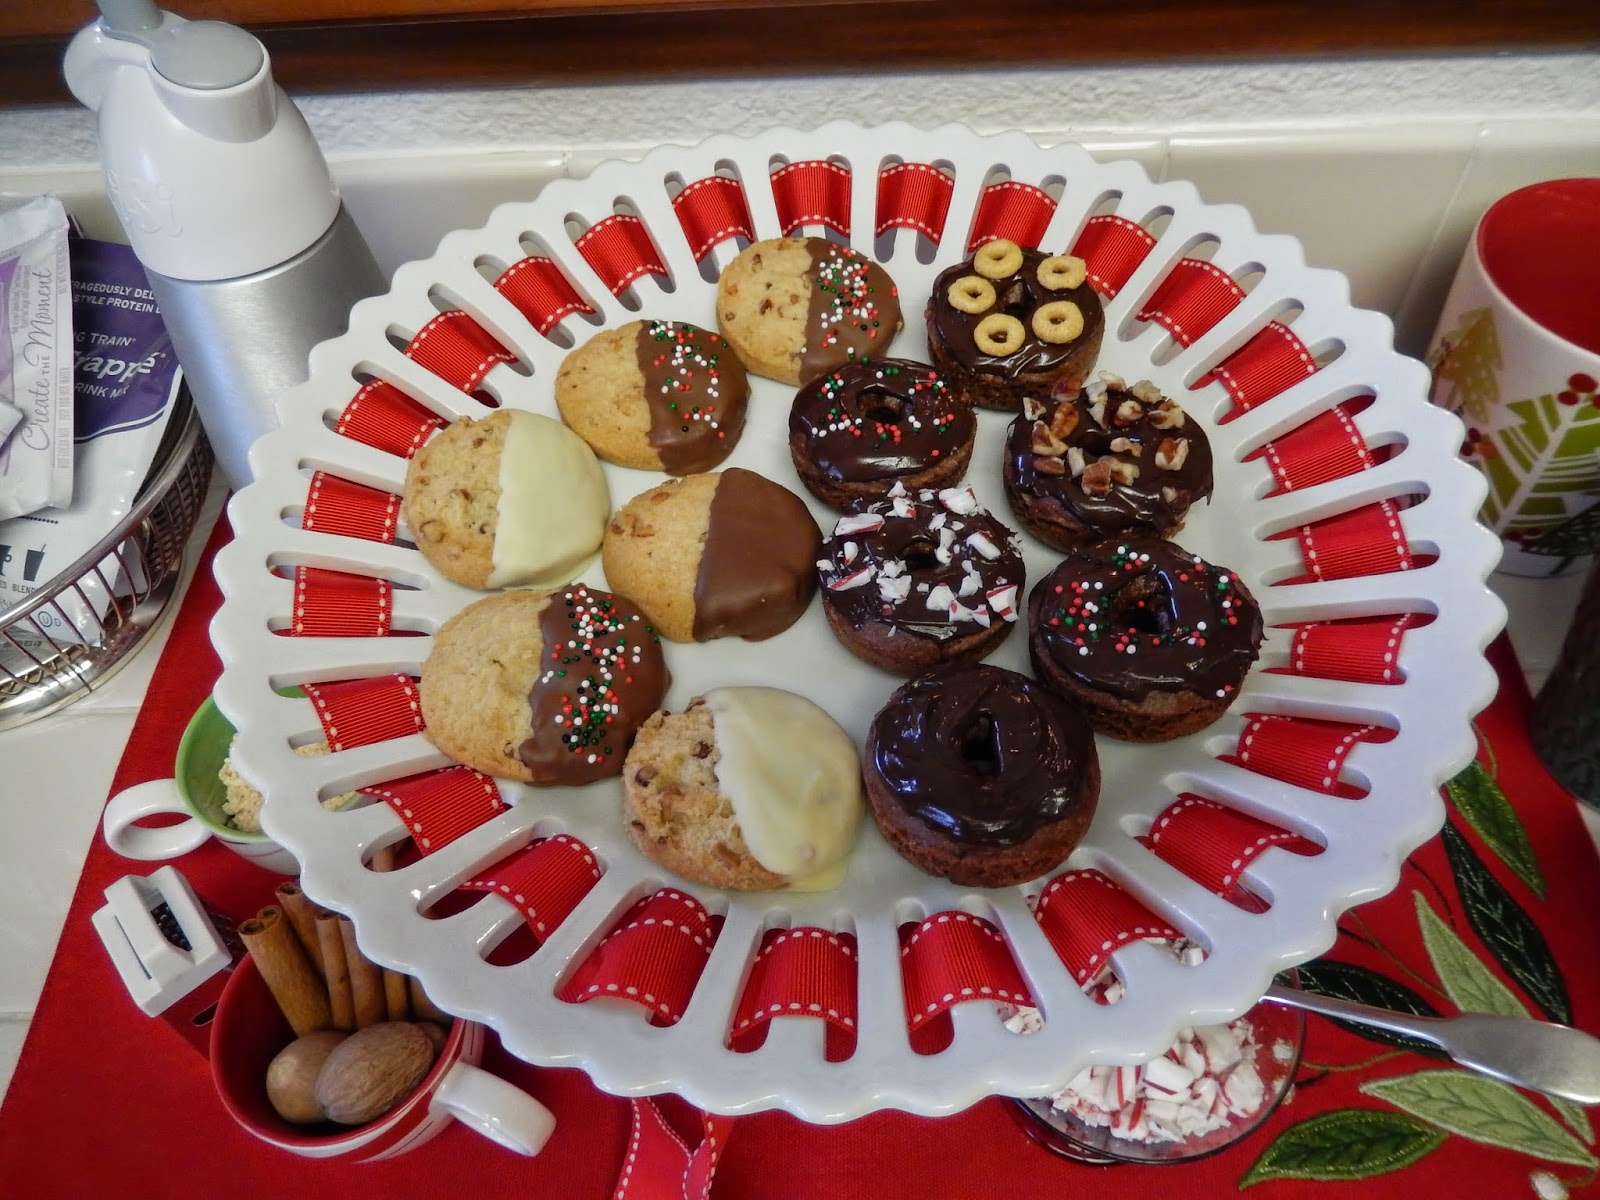 Eggface%2BHoliday%2BDesserts%2BChristmas%2BCookies%2BNo%2BSugar%2BSugar%2BFree%2BProtein%2BDonuts Weight Loss Recipes Christmas Tree Trimming Treats